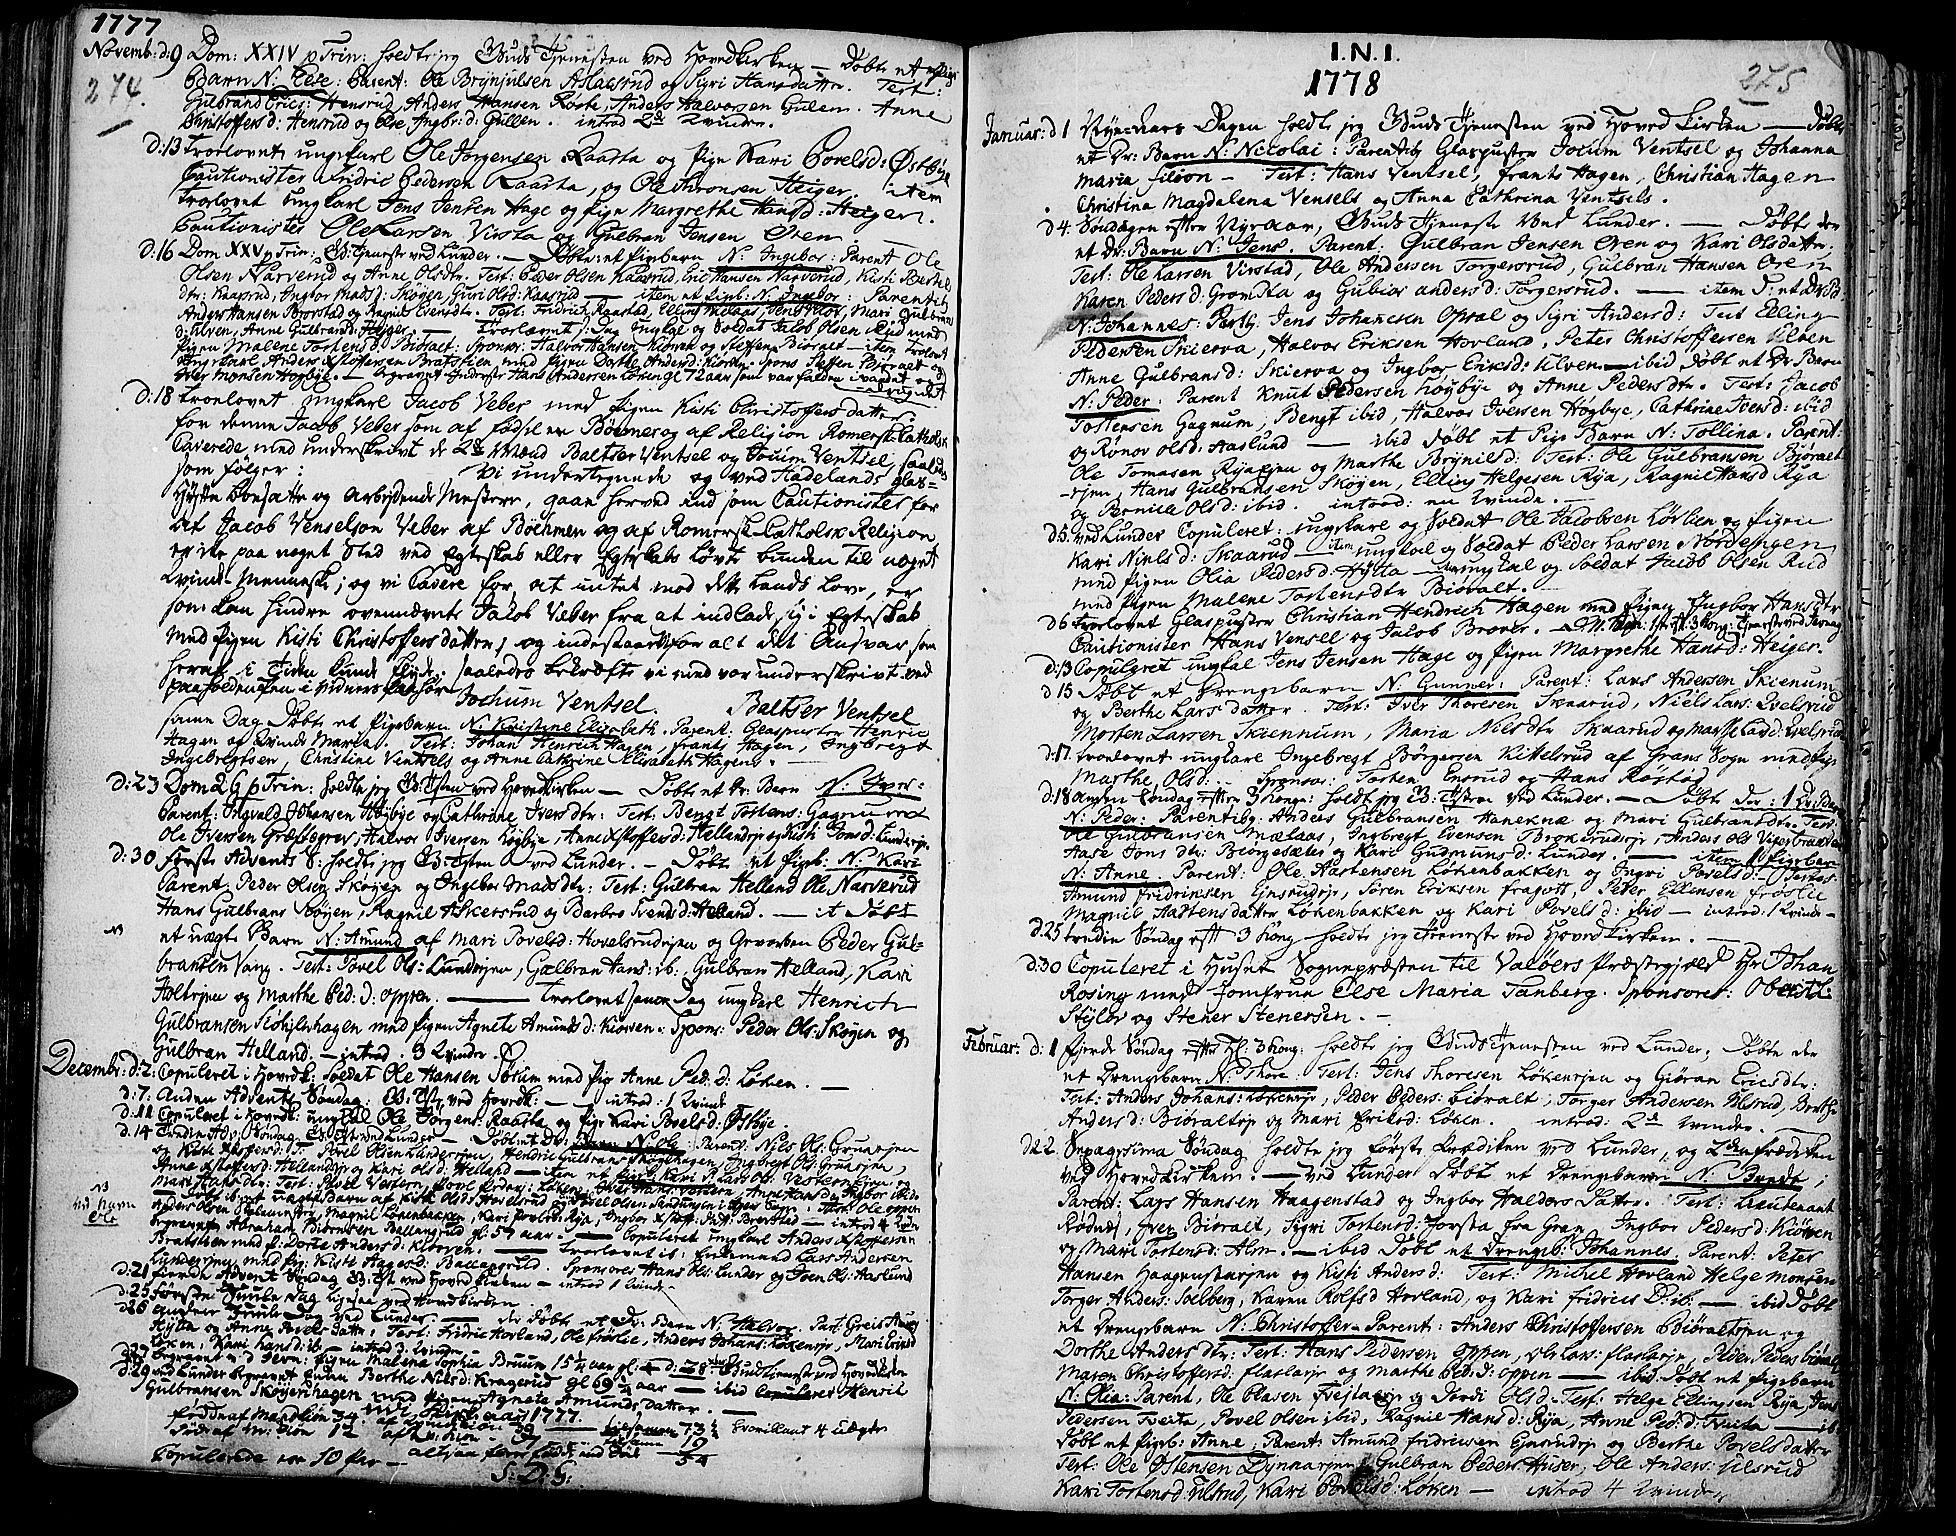 SAH, Jevnaker prestekontor, Ministerialbok nr. 3, 1752-1799, s. 274-275